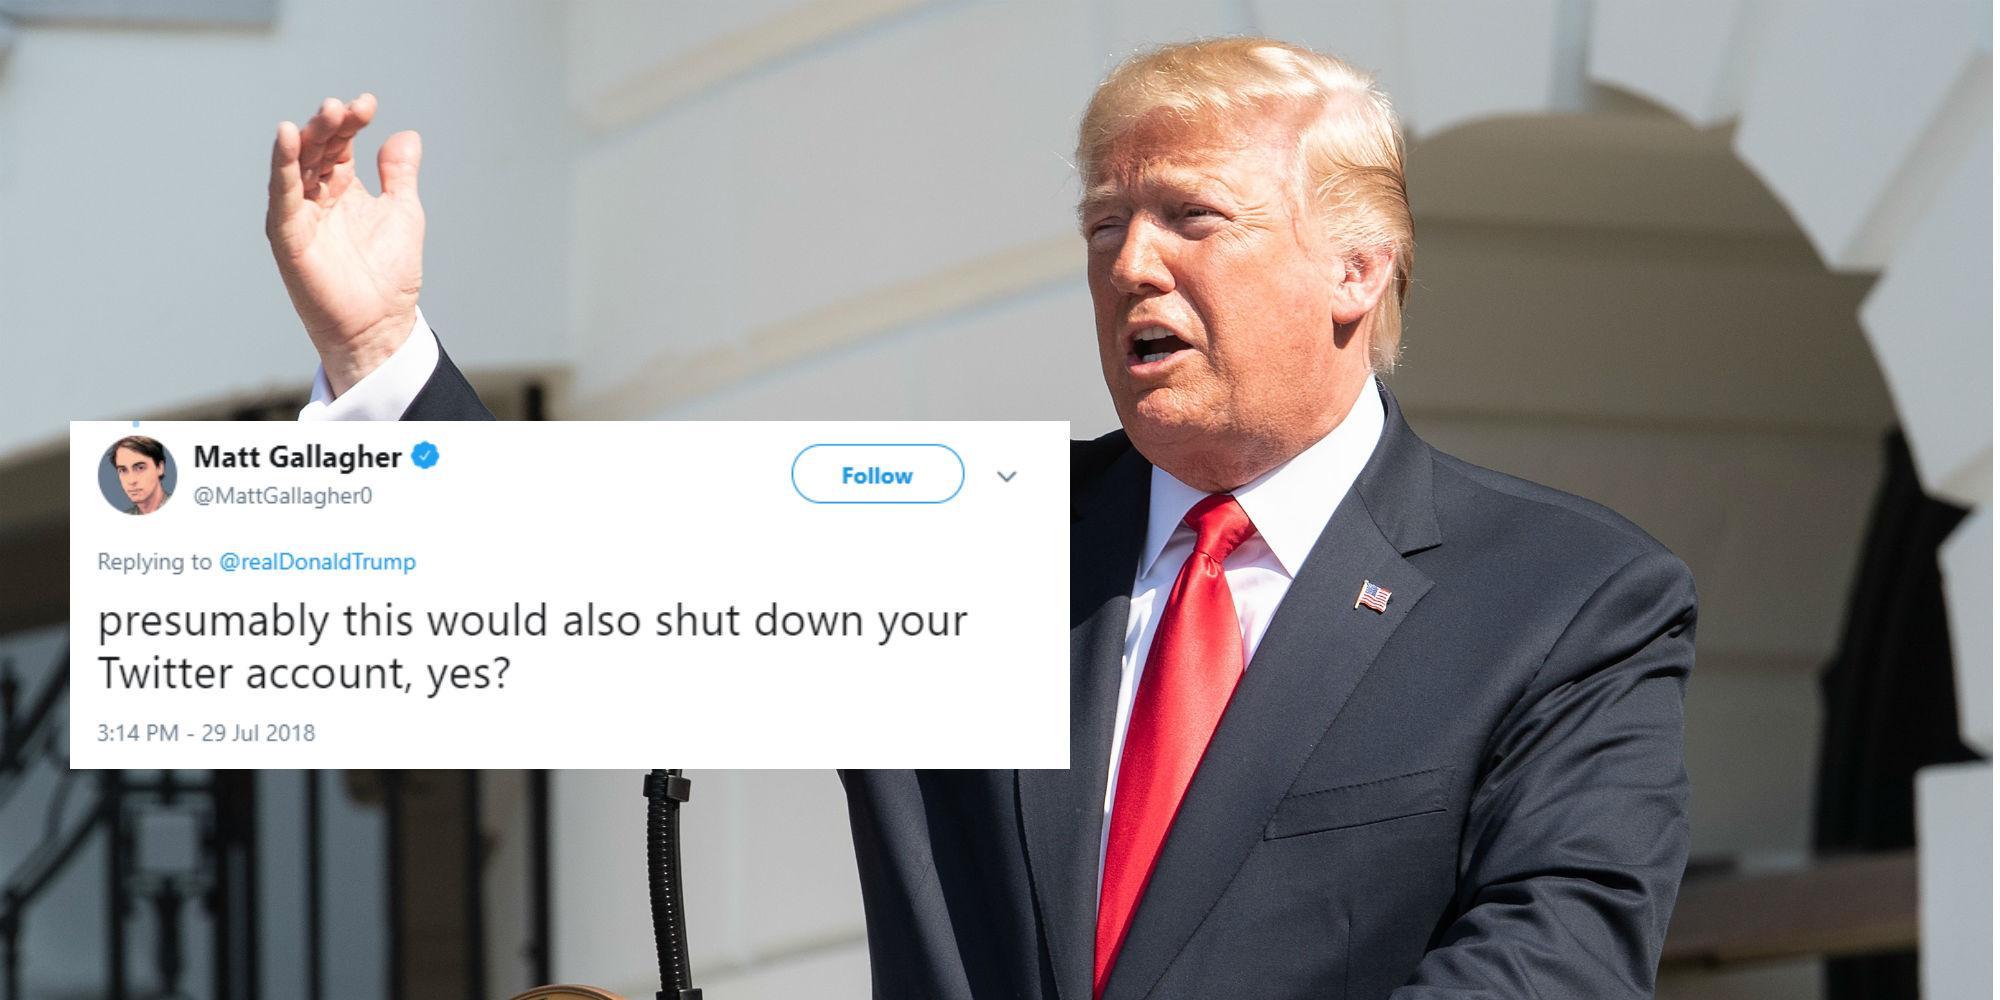 Donald Trump The President Just Threatened To Shut Down